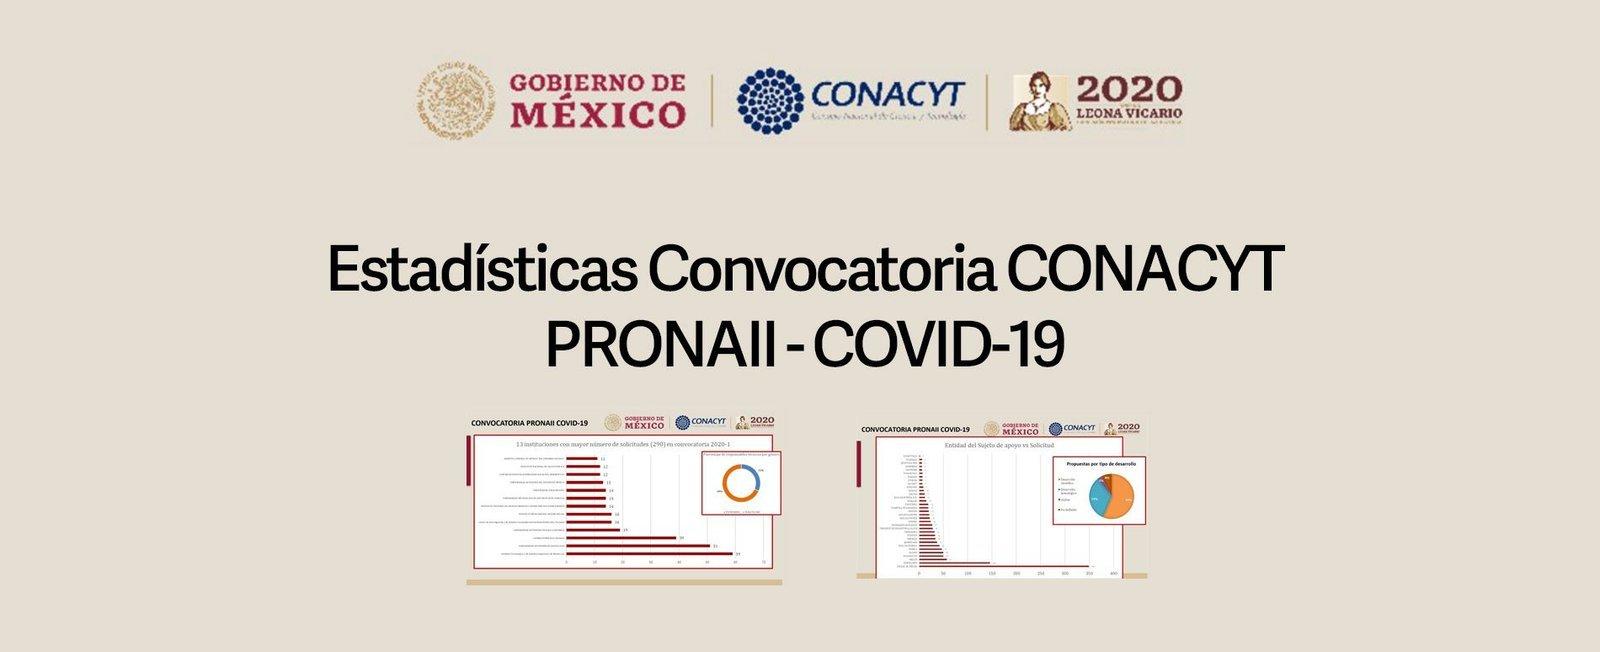 banner_estadisticas_convocatoria_concayt_covid